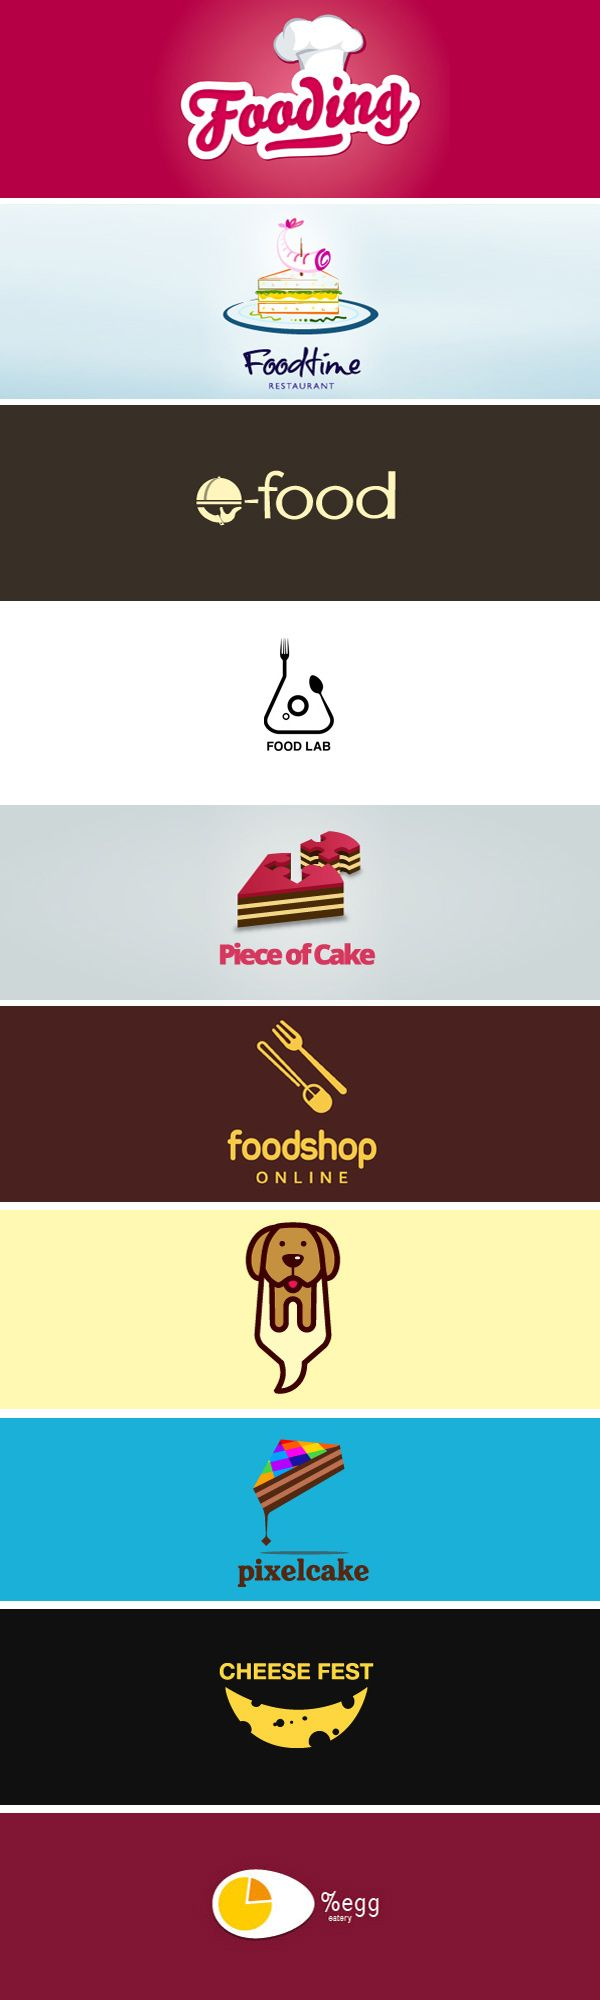 50 Tasty #Food #Logo Designs for #Restaurants and Cafes http://crazypixels.net/50-tasty-food-logo-designs-for-restaurants-and-cafes/